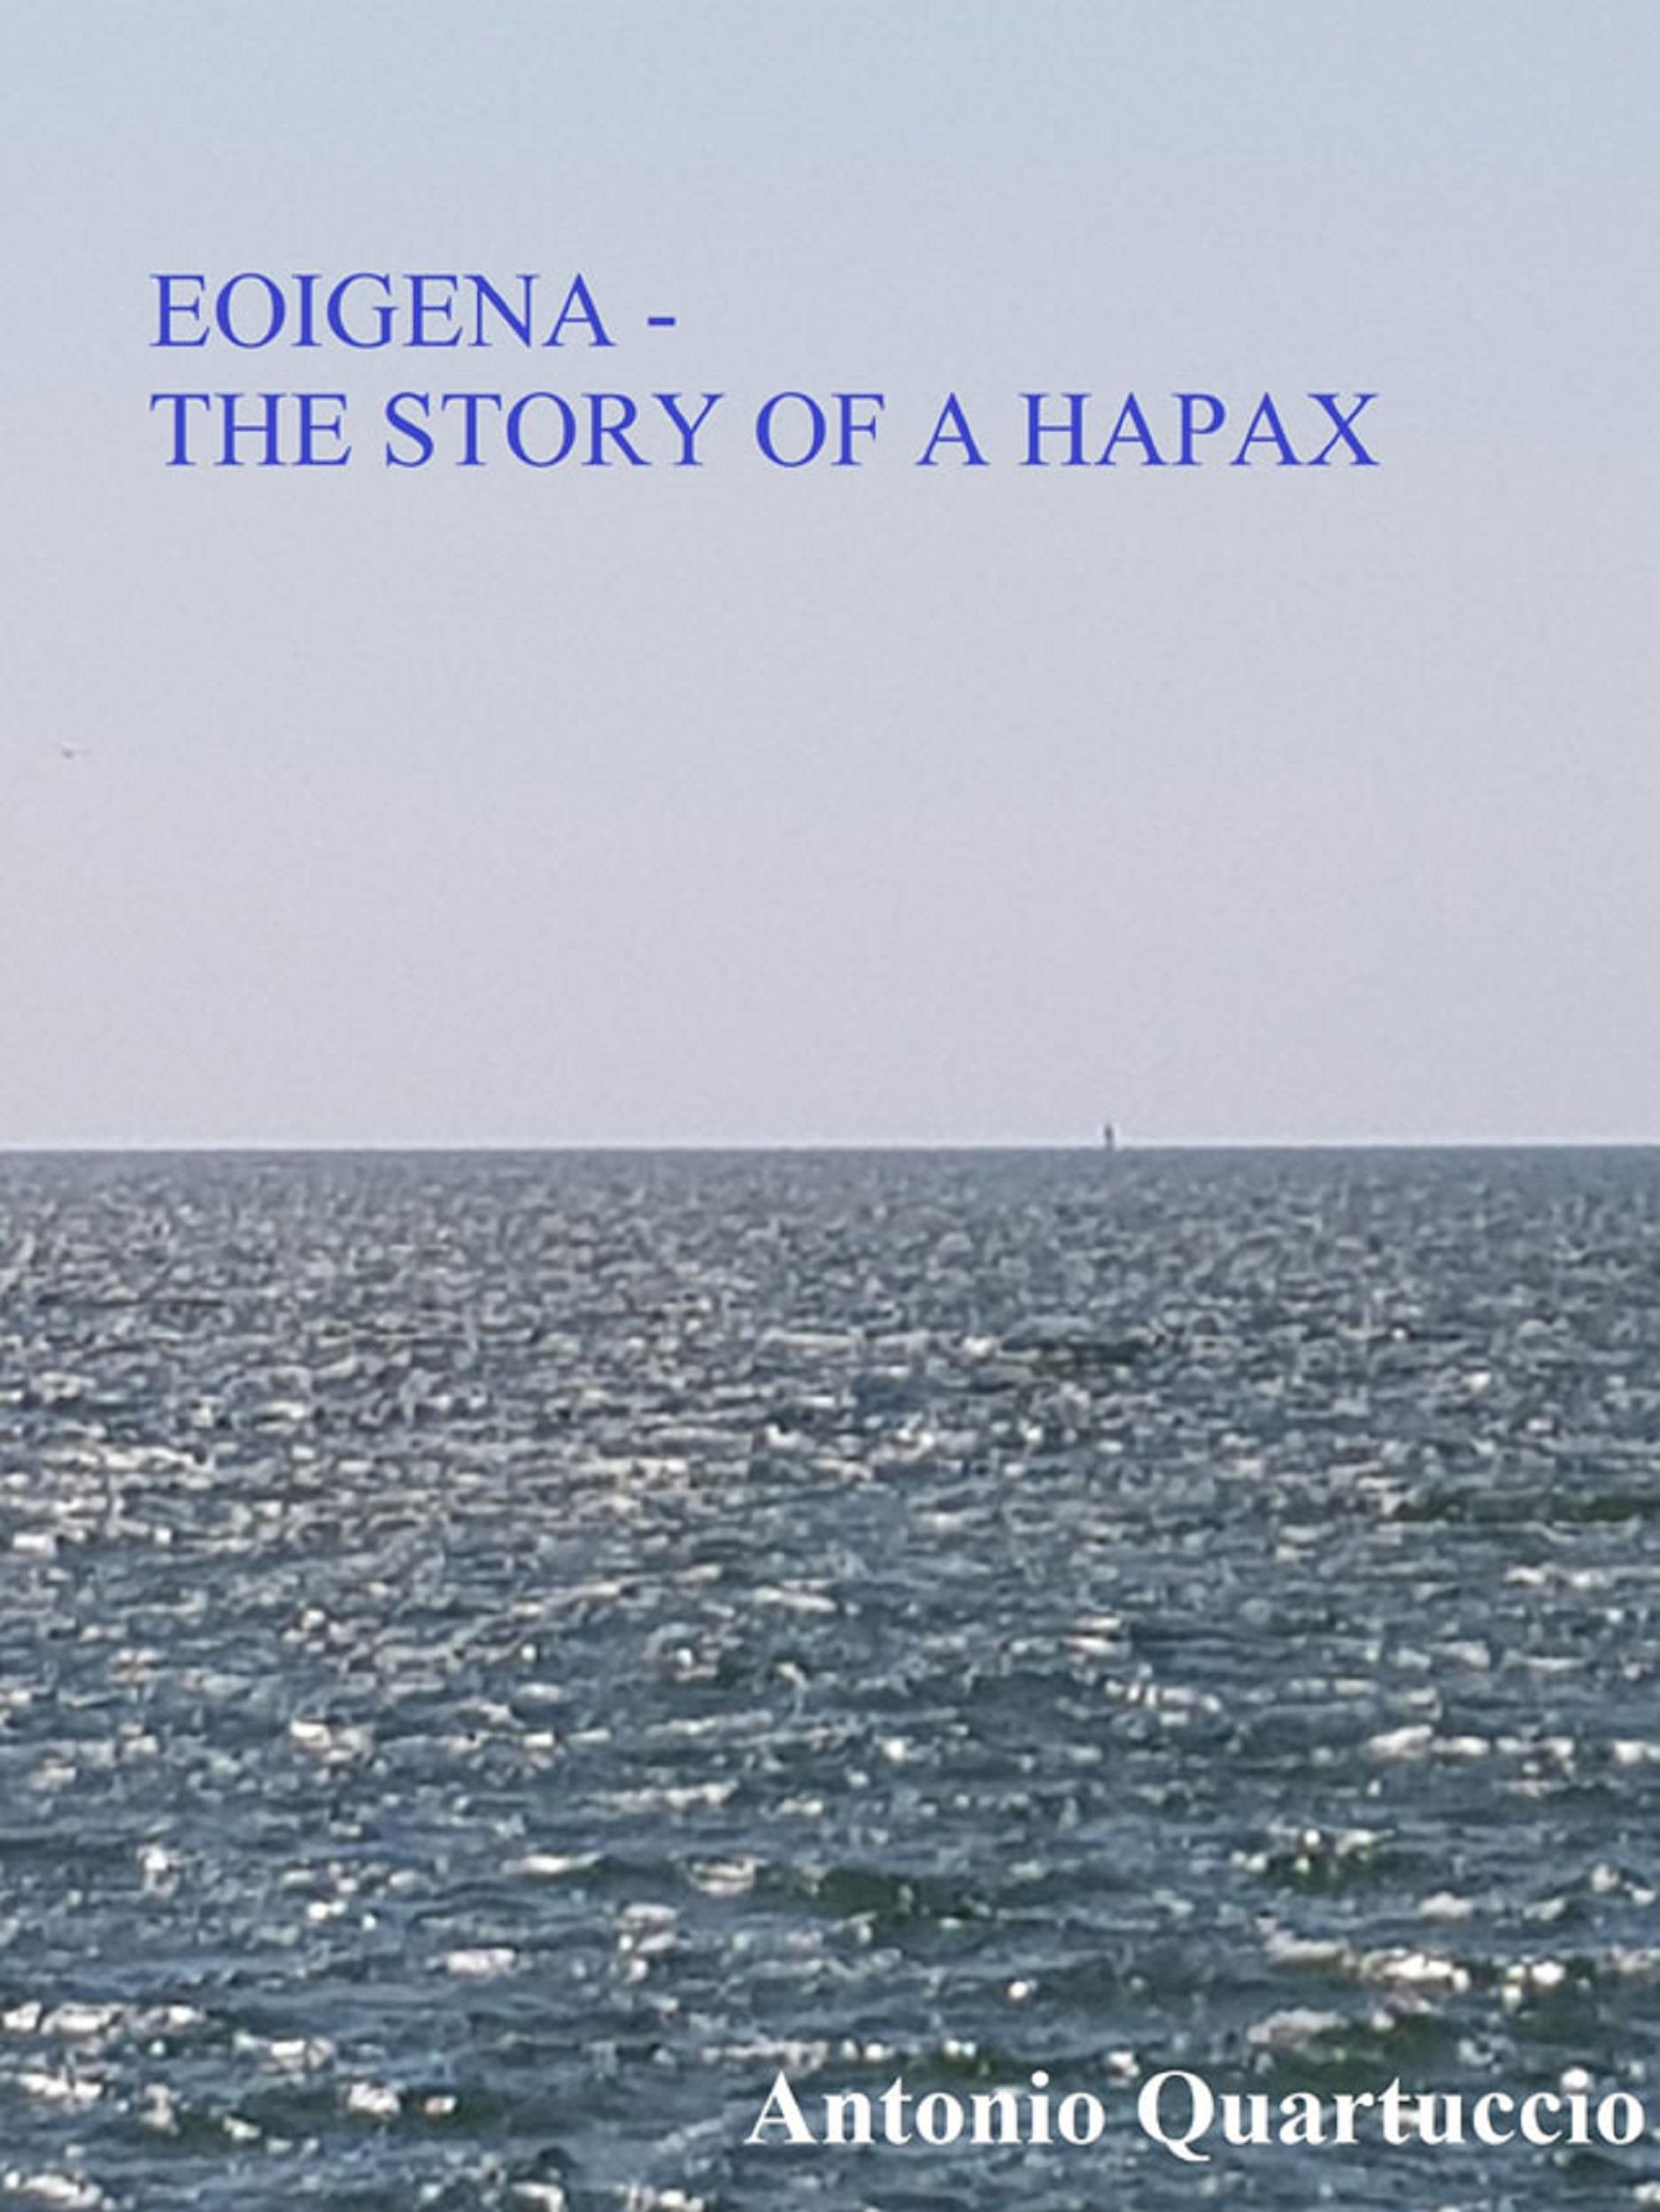 EOIGENA - The story of a Hapax